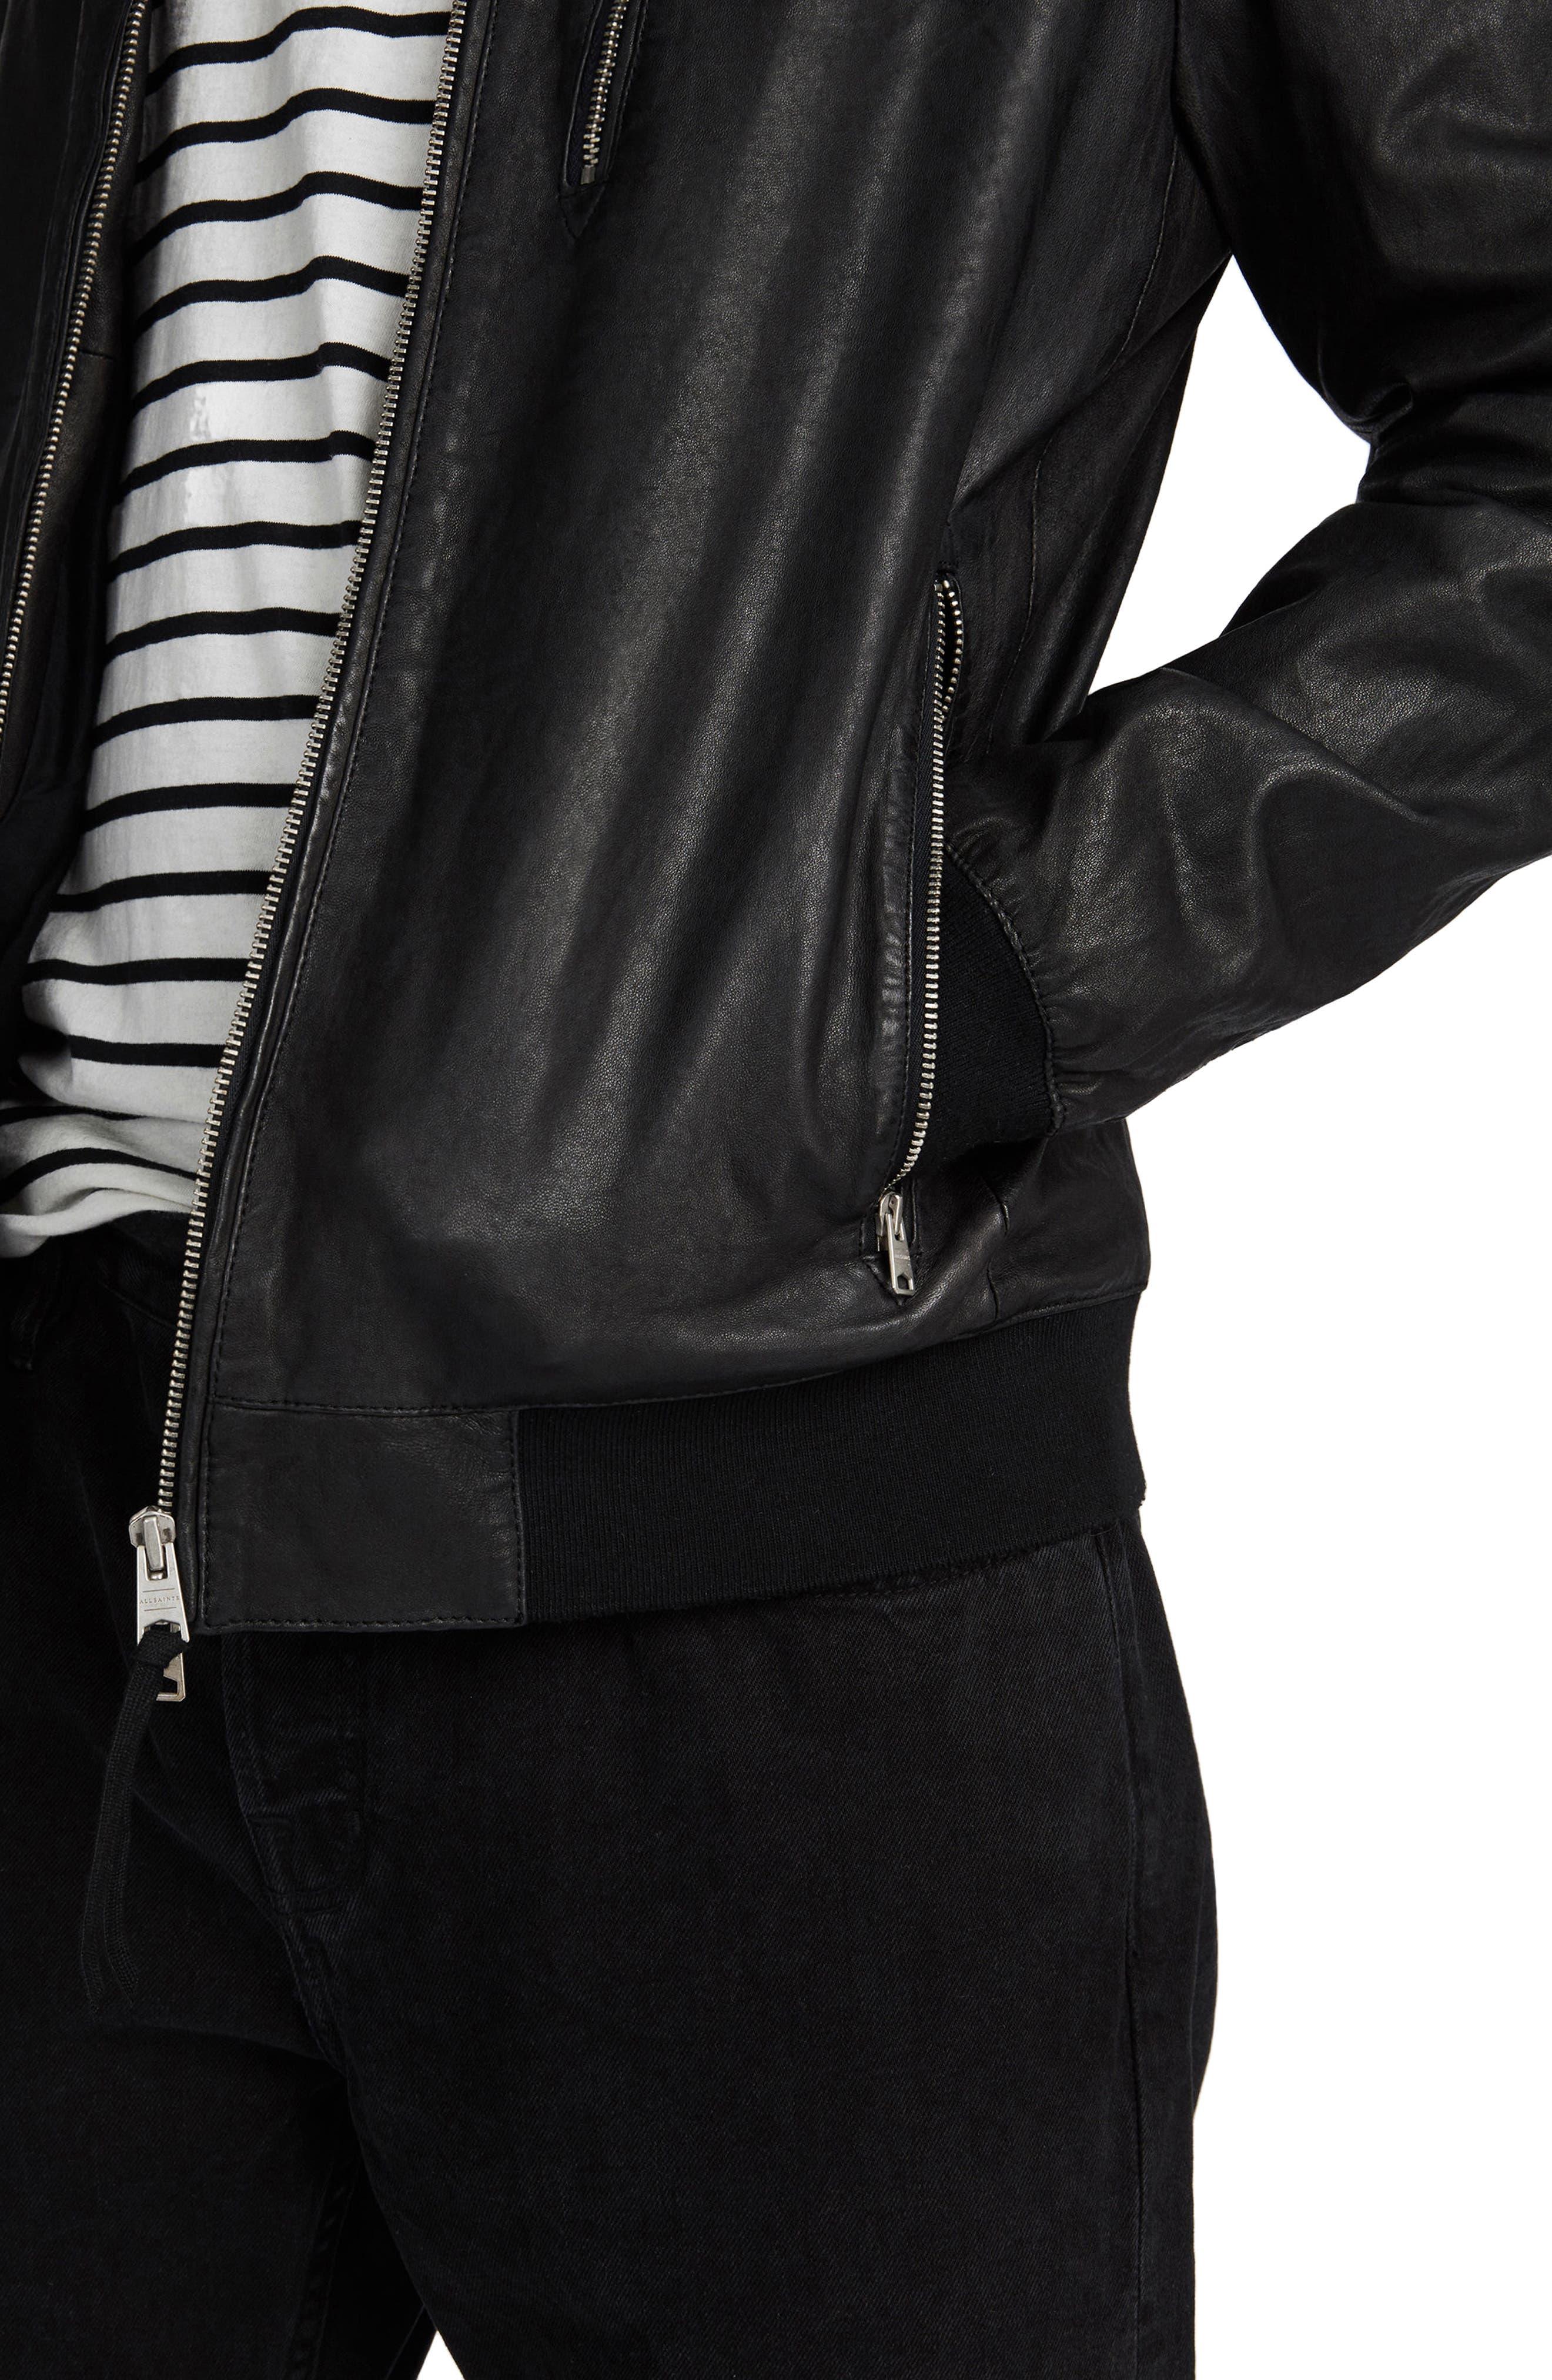 Kino Leather Bomber Jacket,                             Alternate thumbnail 3, color,                             001